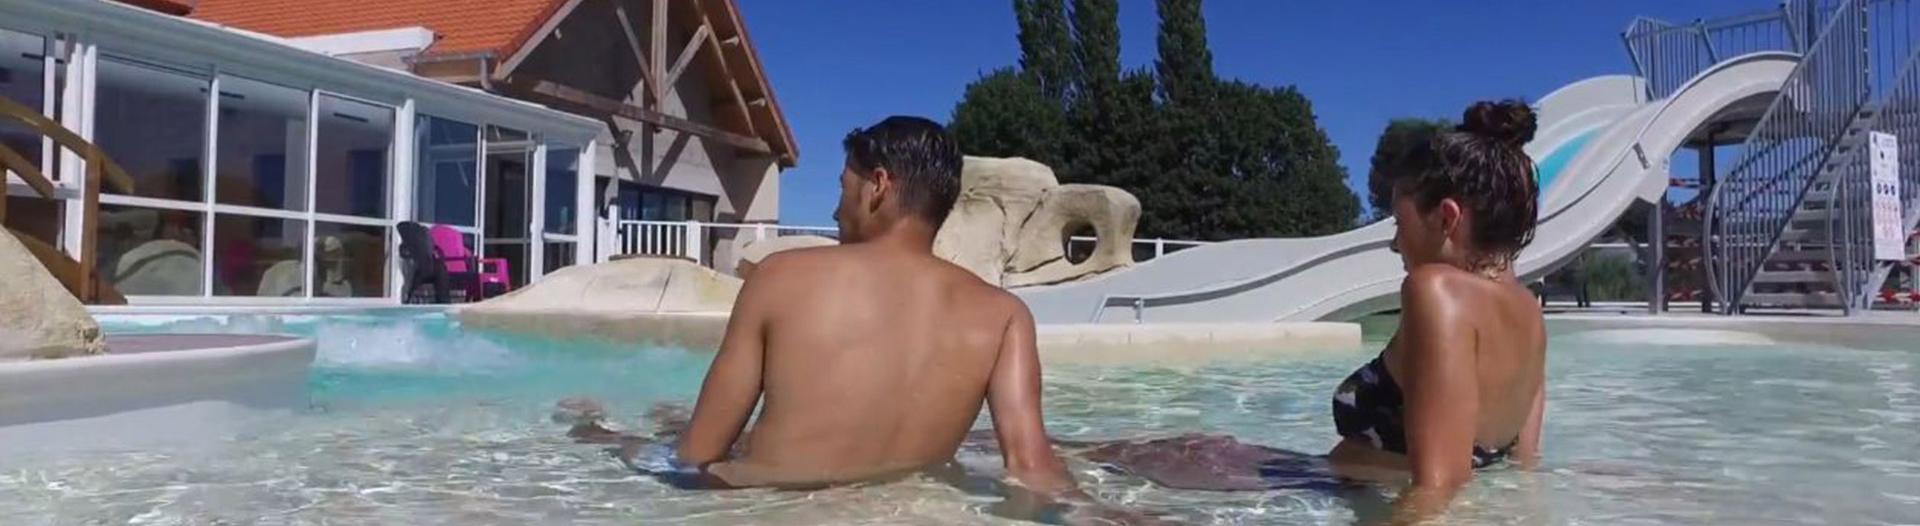 camping-roseliere-piscine-et-toboggan-slider